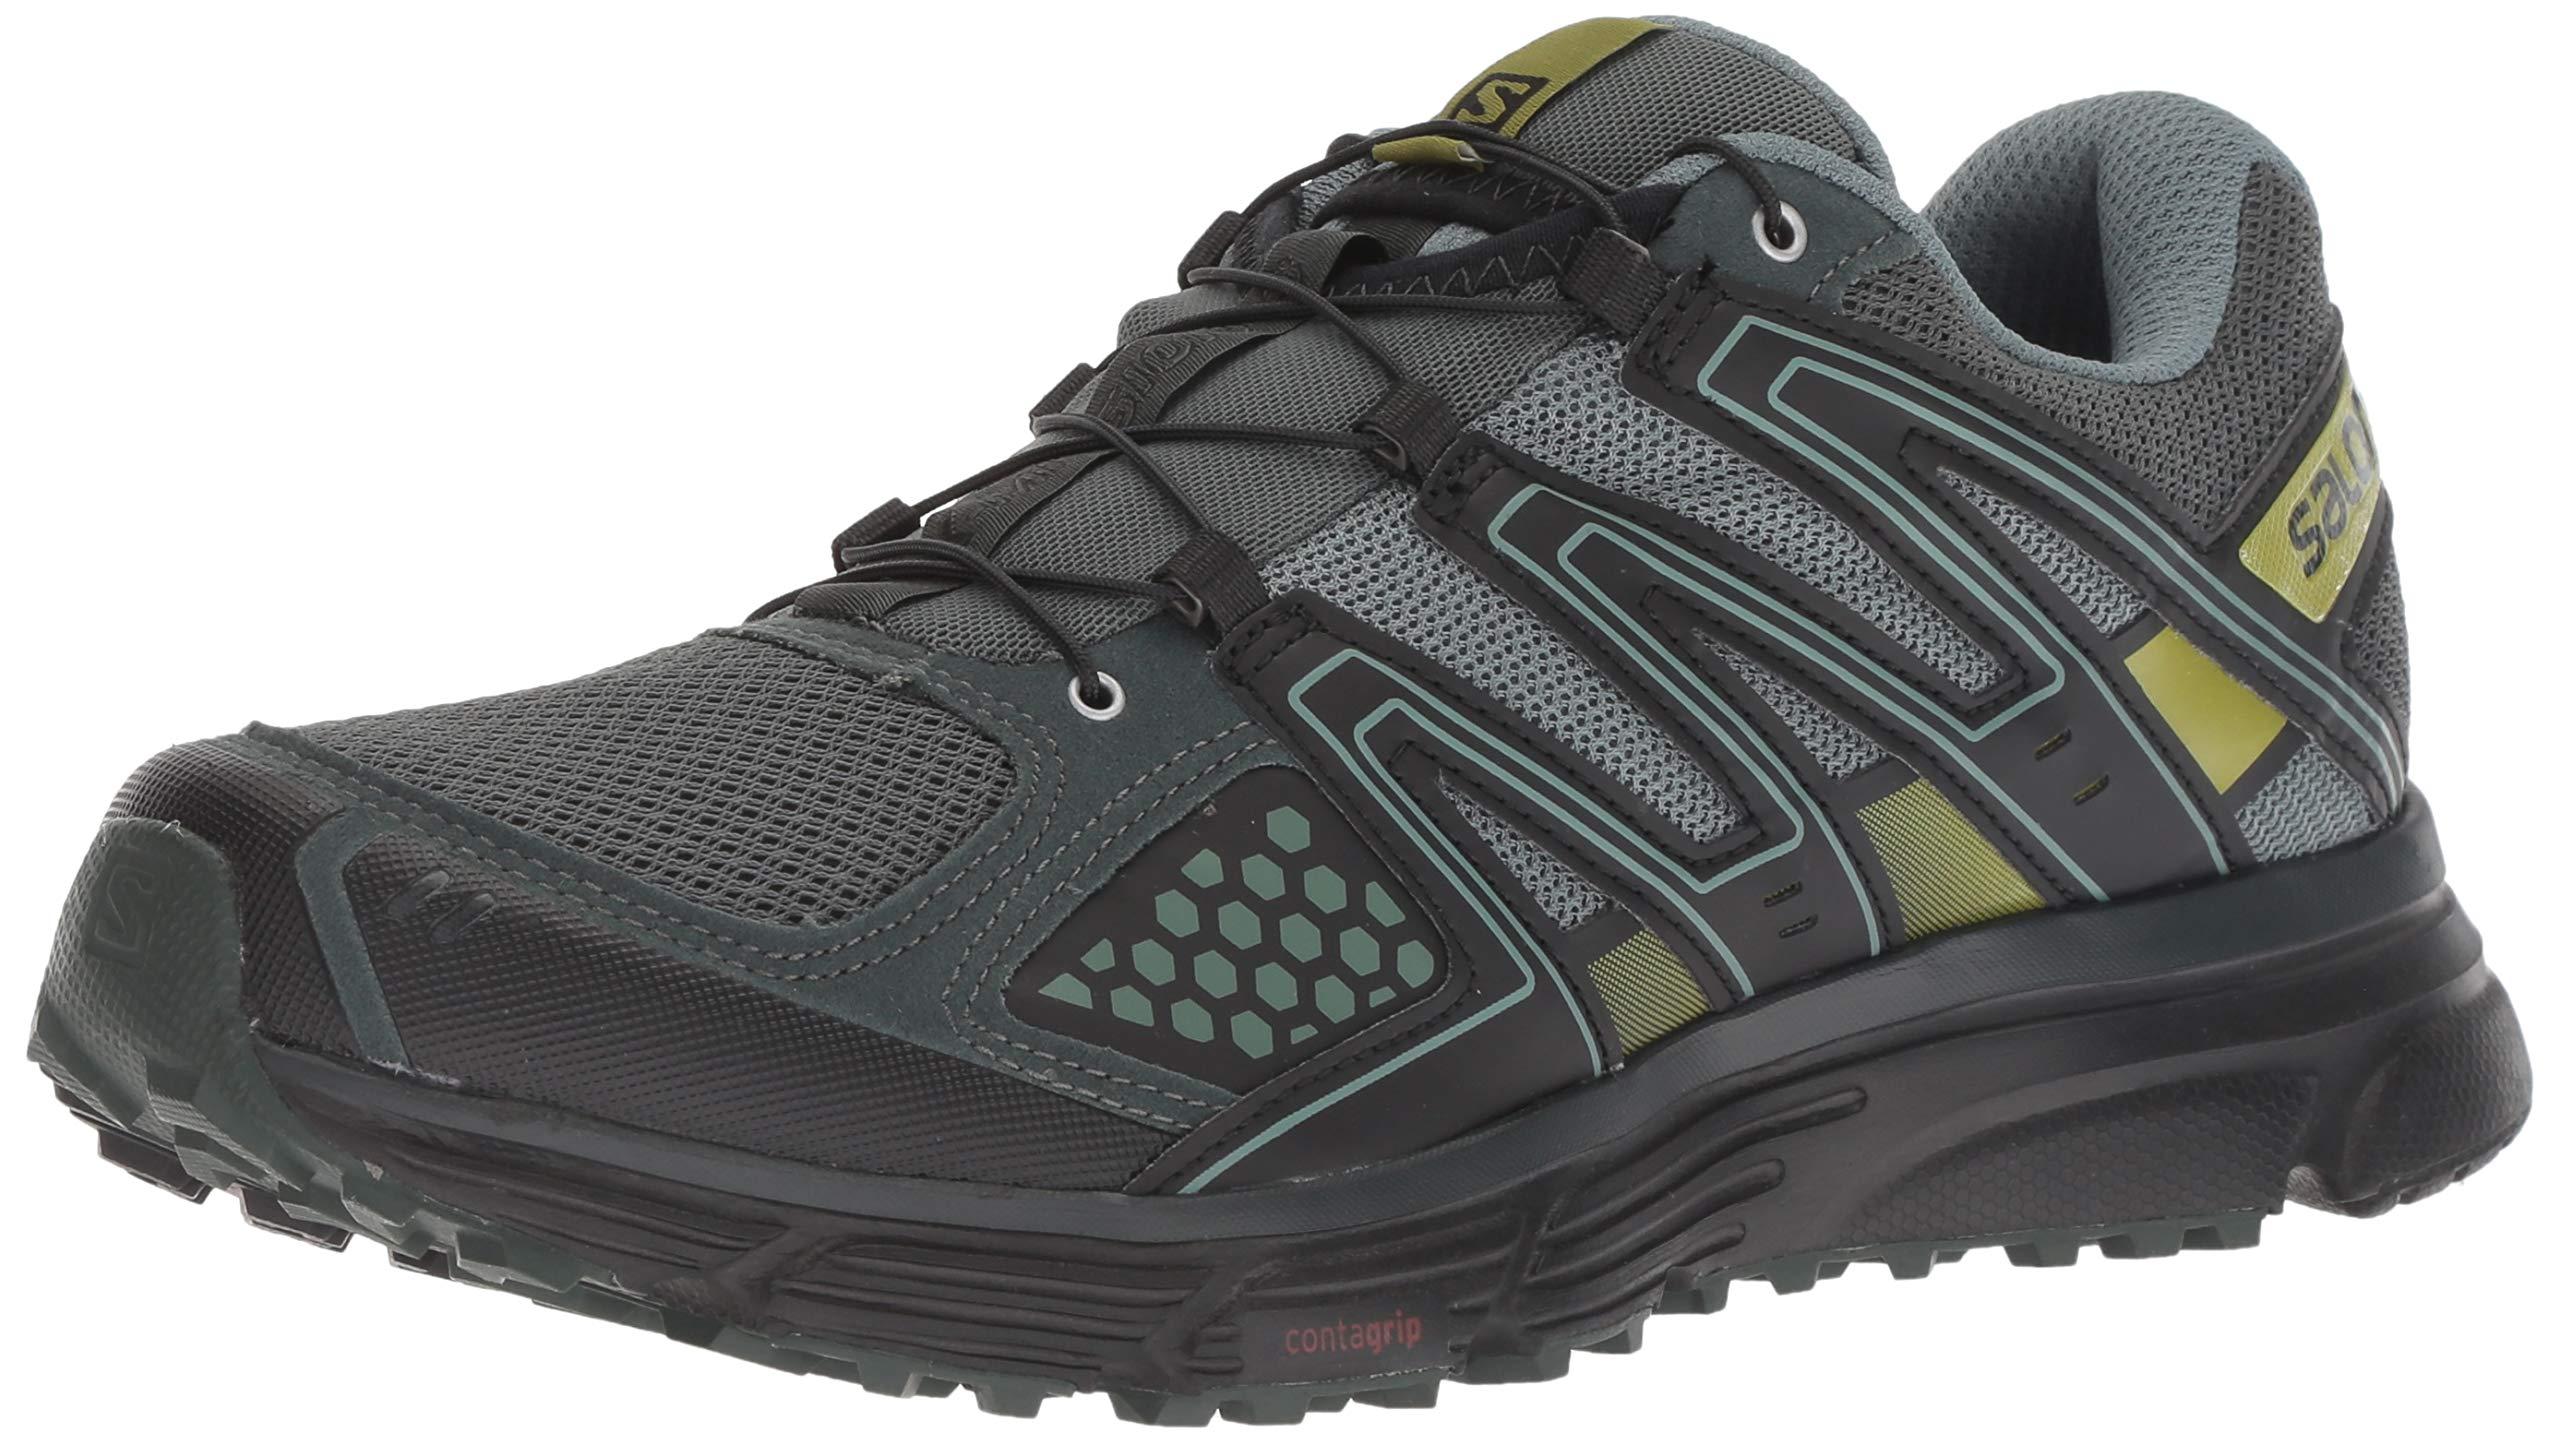 SALOMON Men's X-Mission 3 Trail Running Shoes, Urban Chic/Black/Guacamole, 10.5 by SALOMON